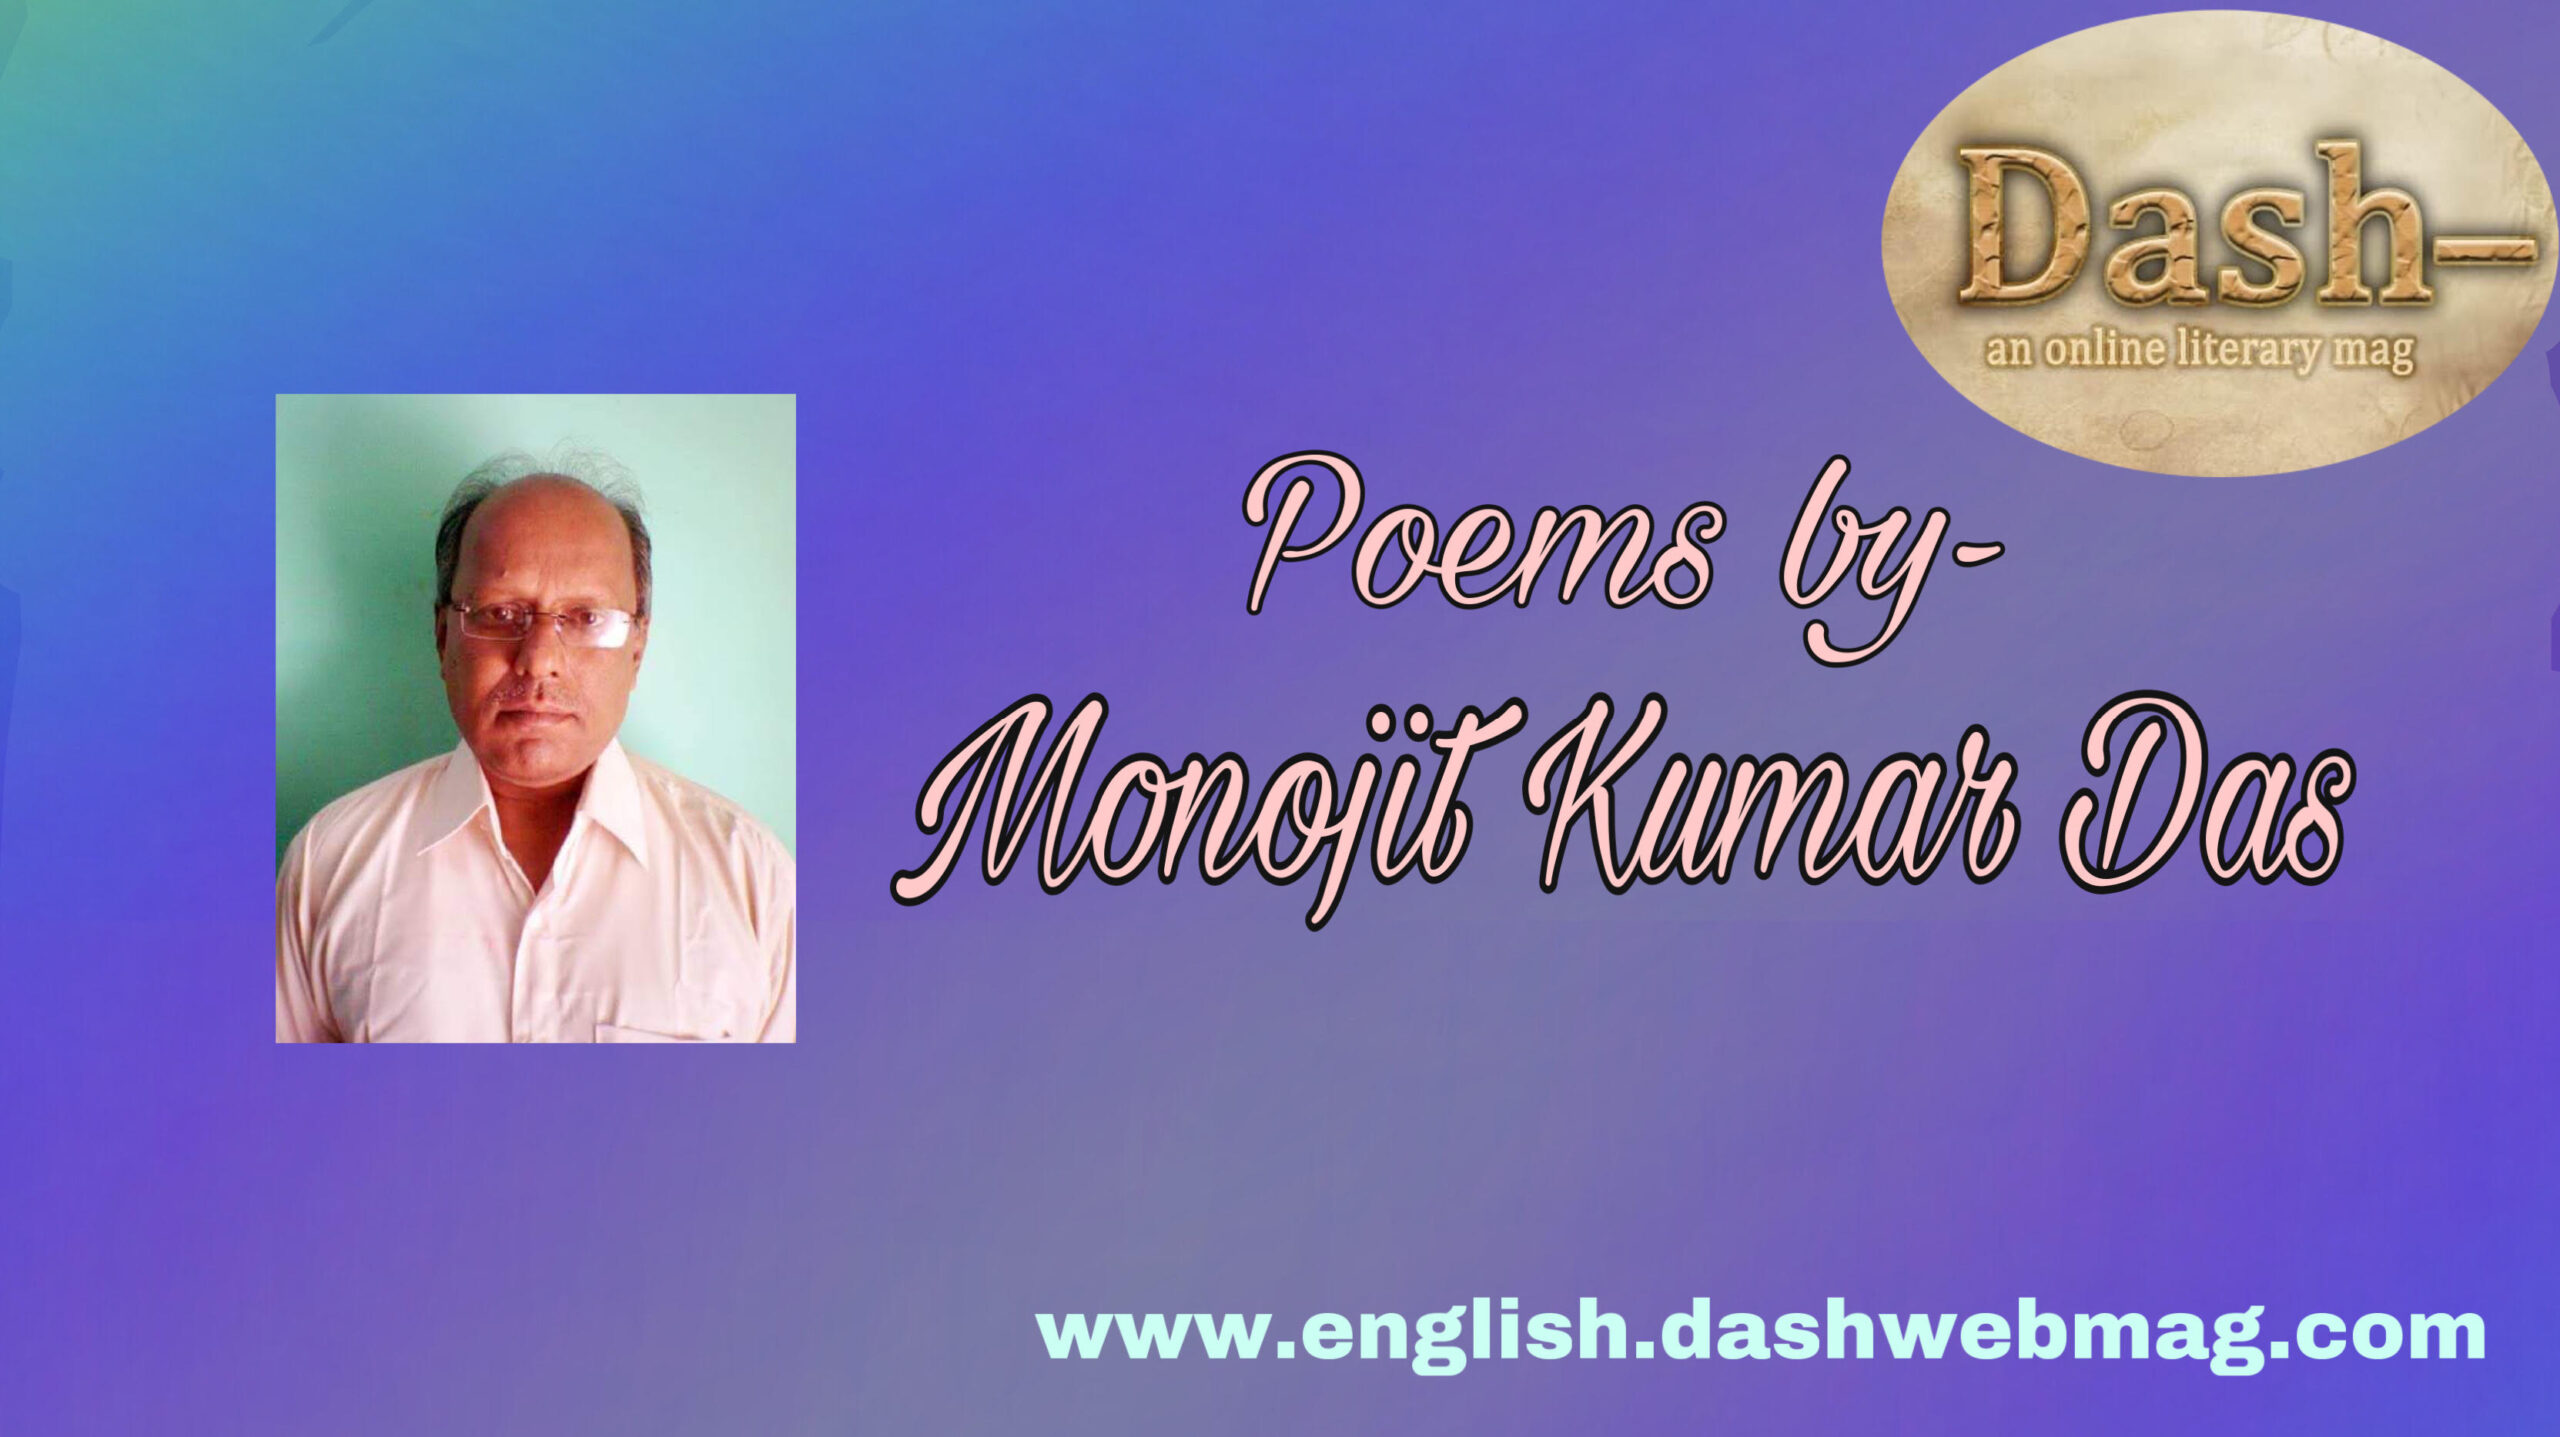 Poems by- Manojit KumarDas